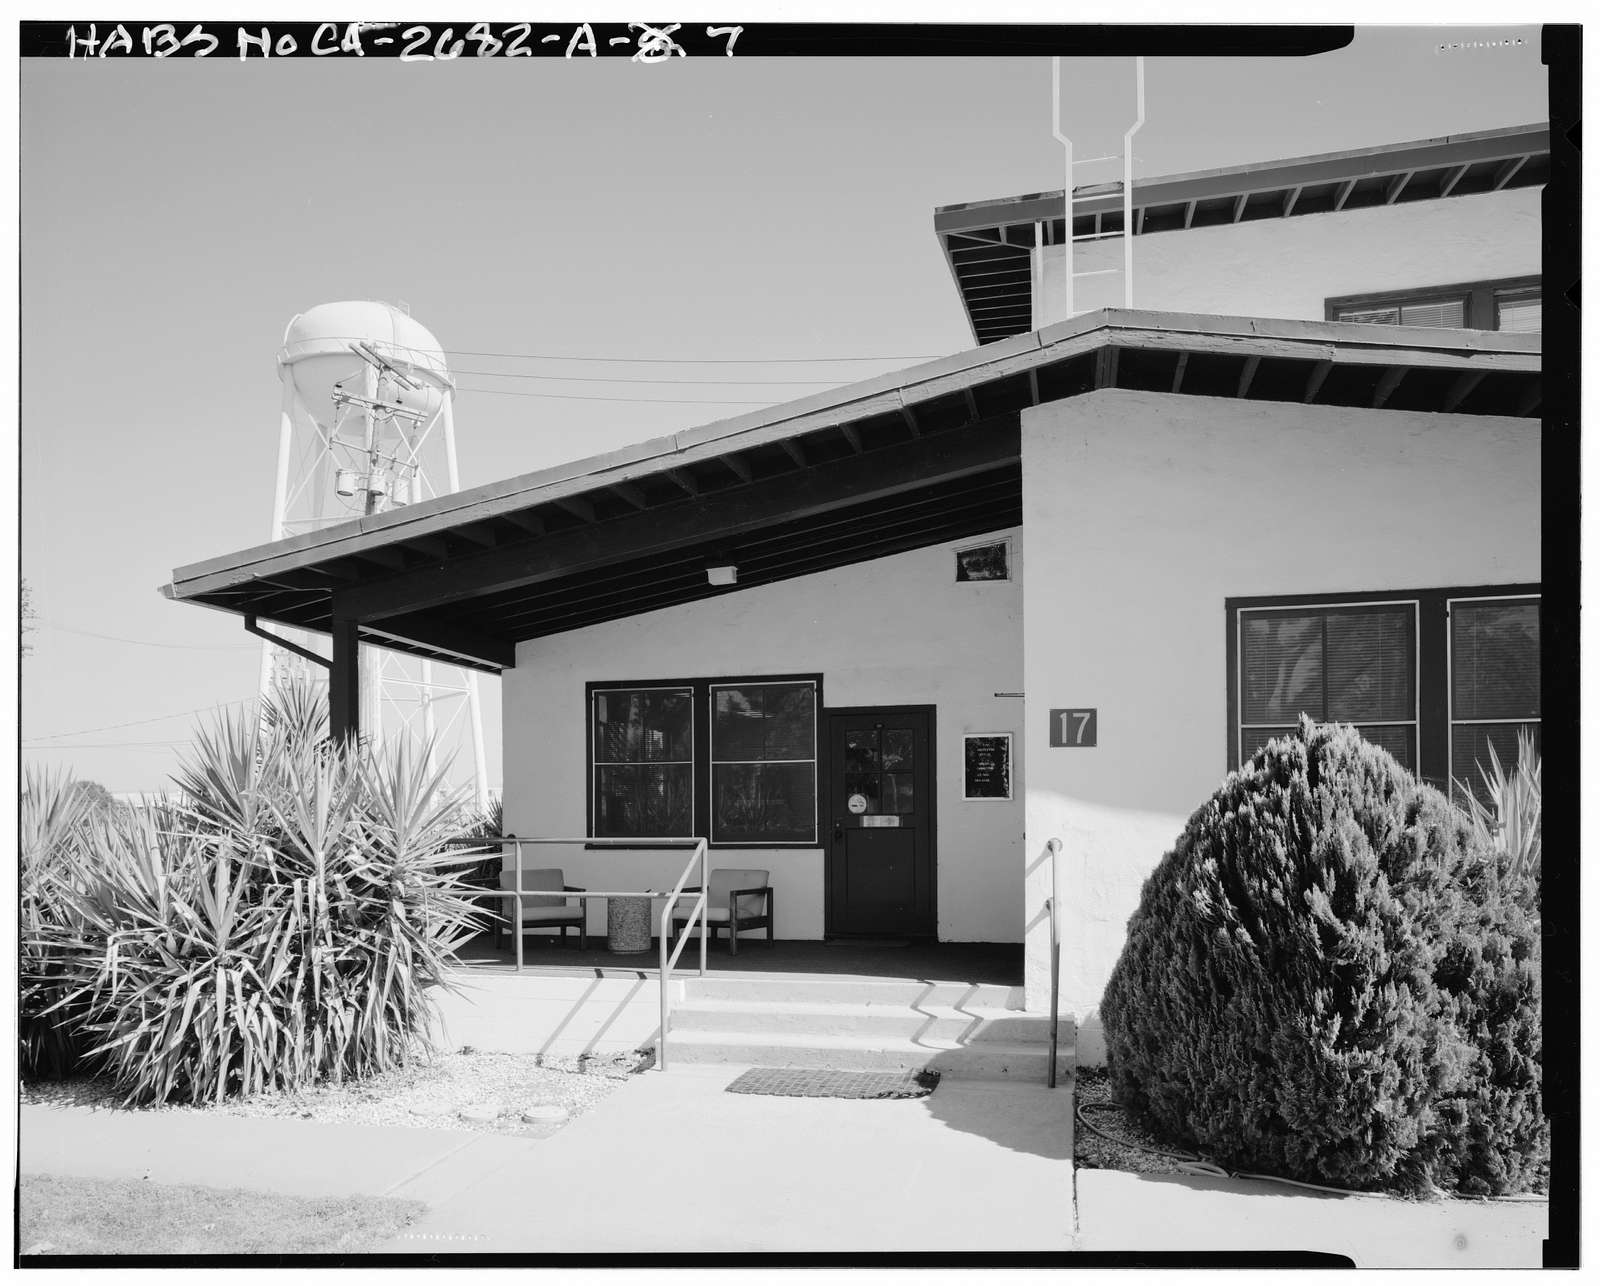 Naval Supply Annex Stockton, Police Station, North of Main Gate on Fyffe Avenue, Stockton, San Joaquin County, CA